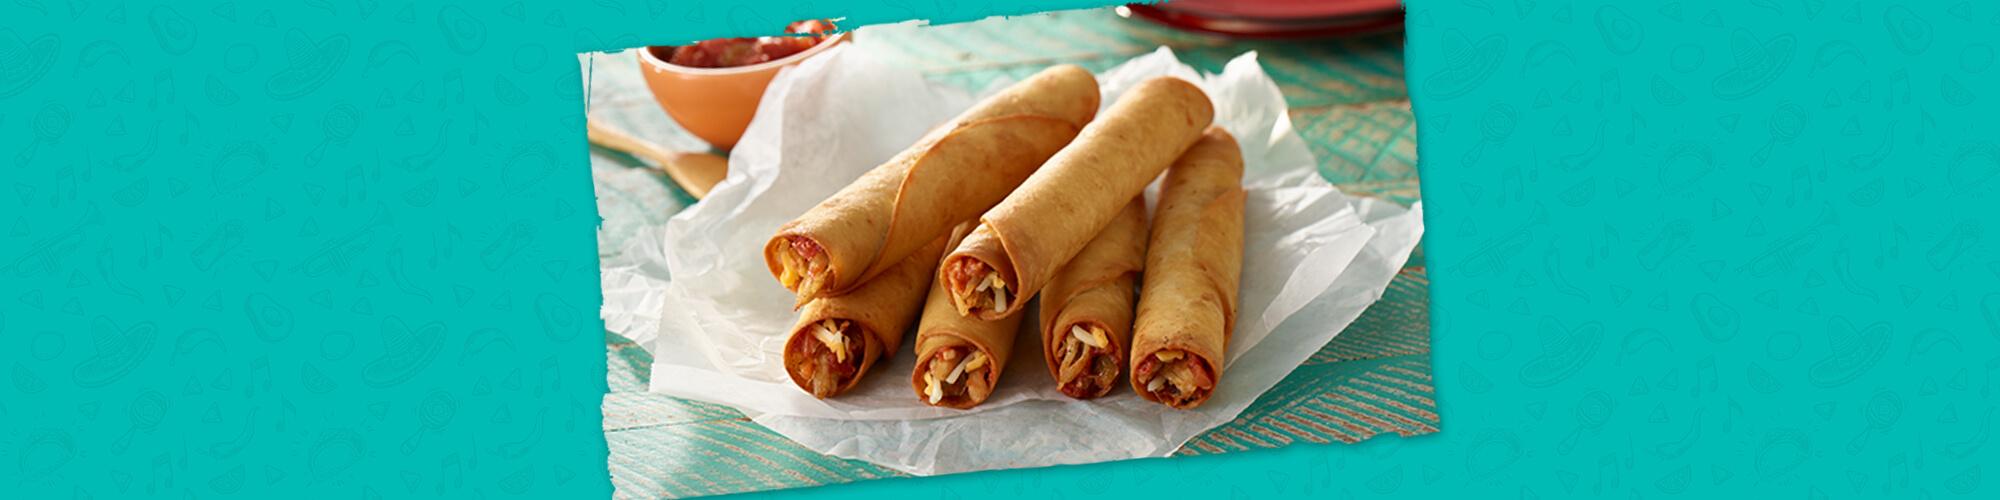 Salsas cheesy chicken flautas